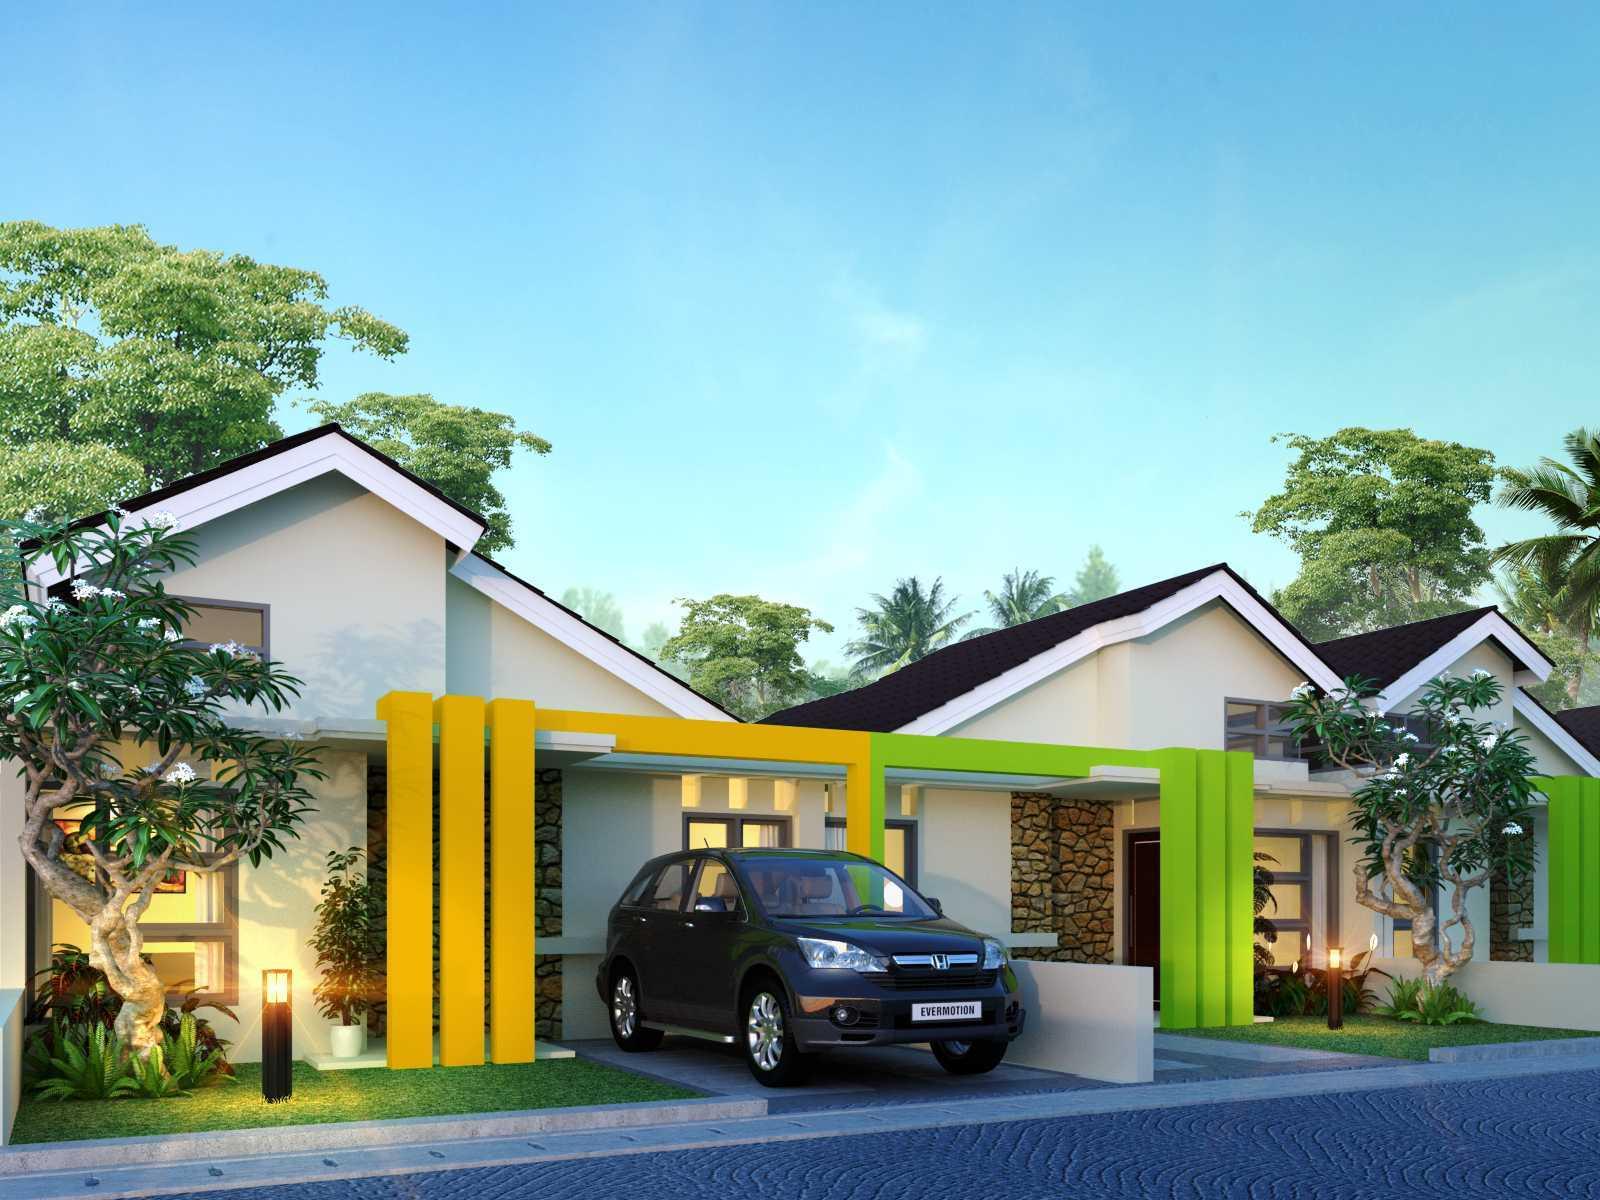 Gubah Ruang Studio B Residence Jakarta, Daerah Khusus Ibukota Jakarta, Indonesia Jakarta, Daerah Khusus Ibukota Jakarta, Indonesia Facade View   50699